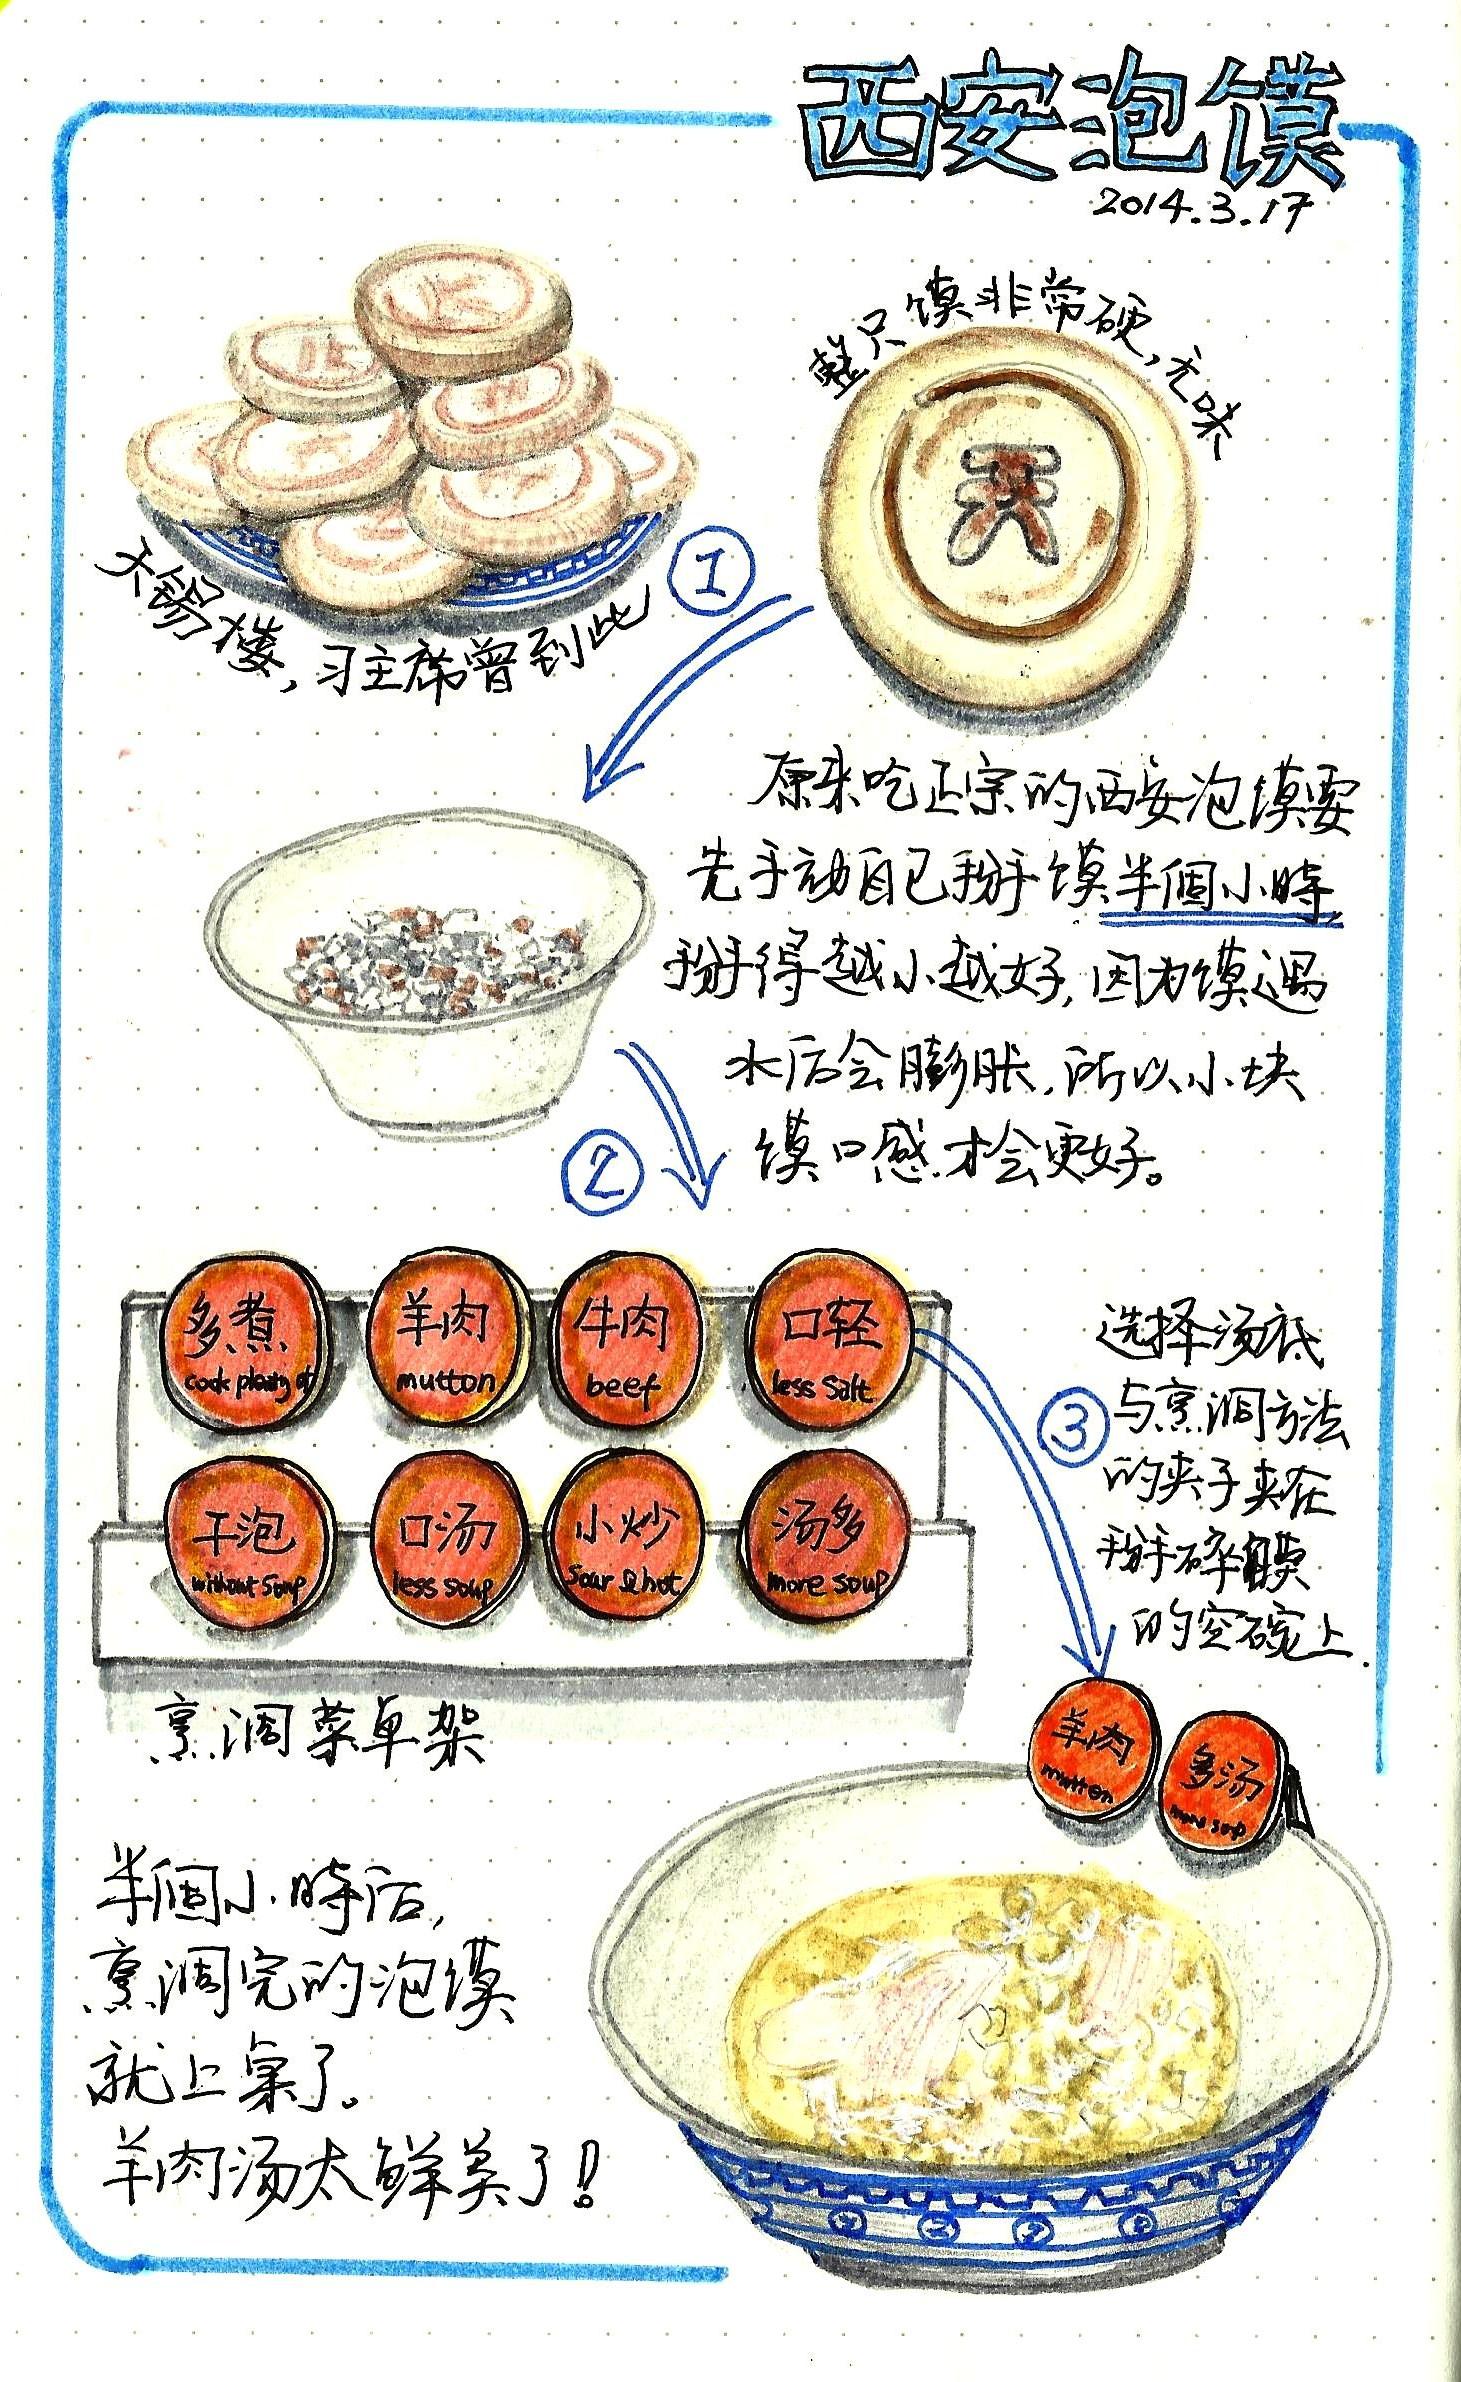 Xi'an Local food